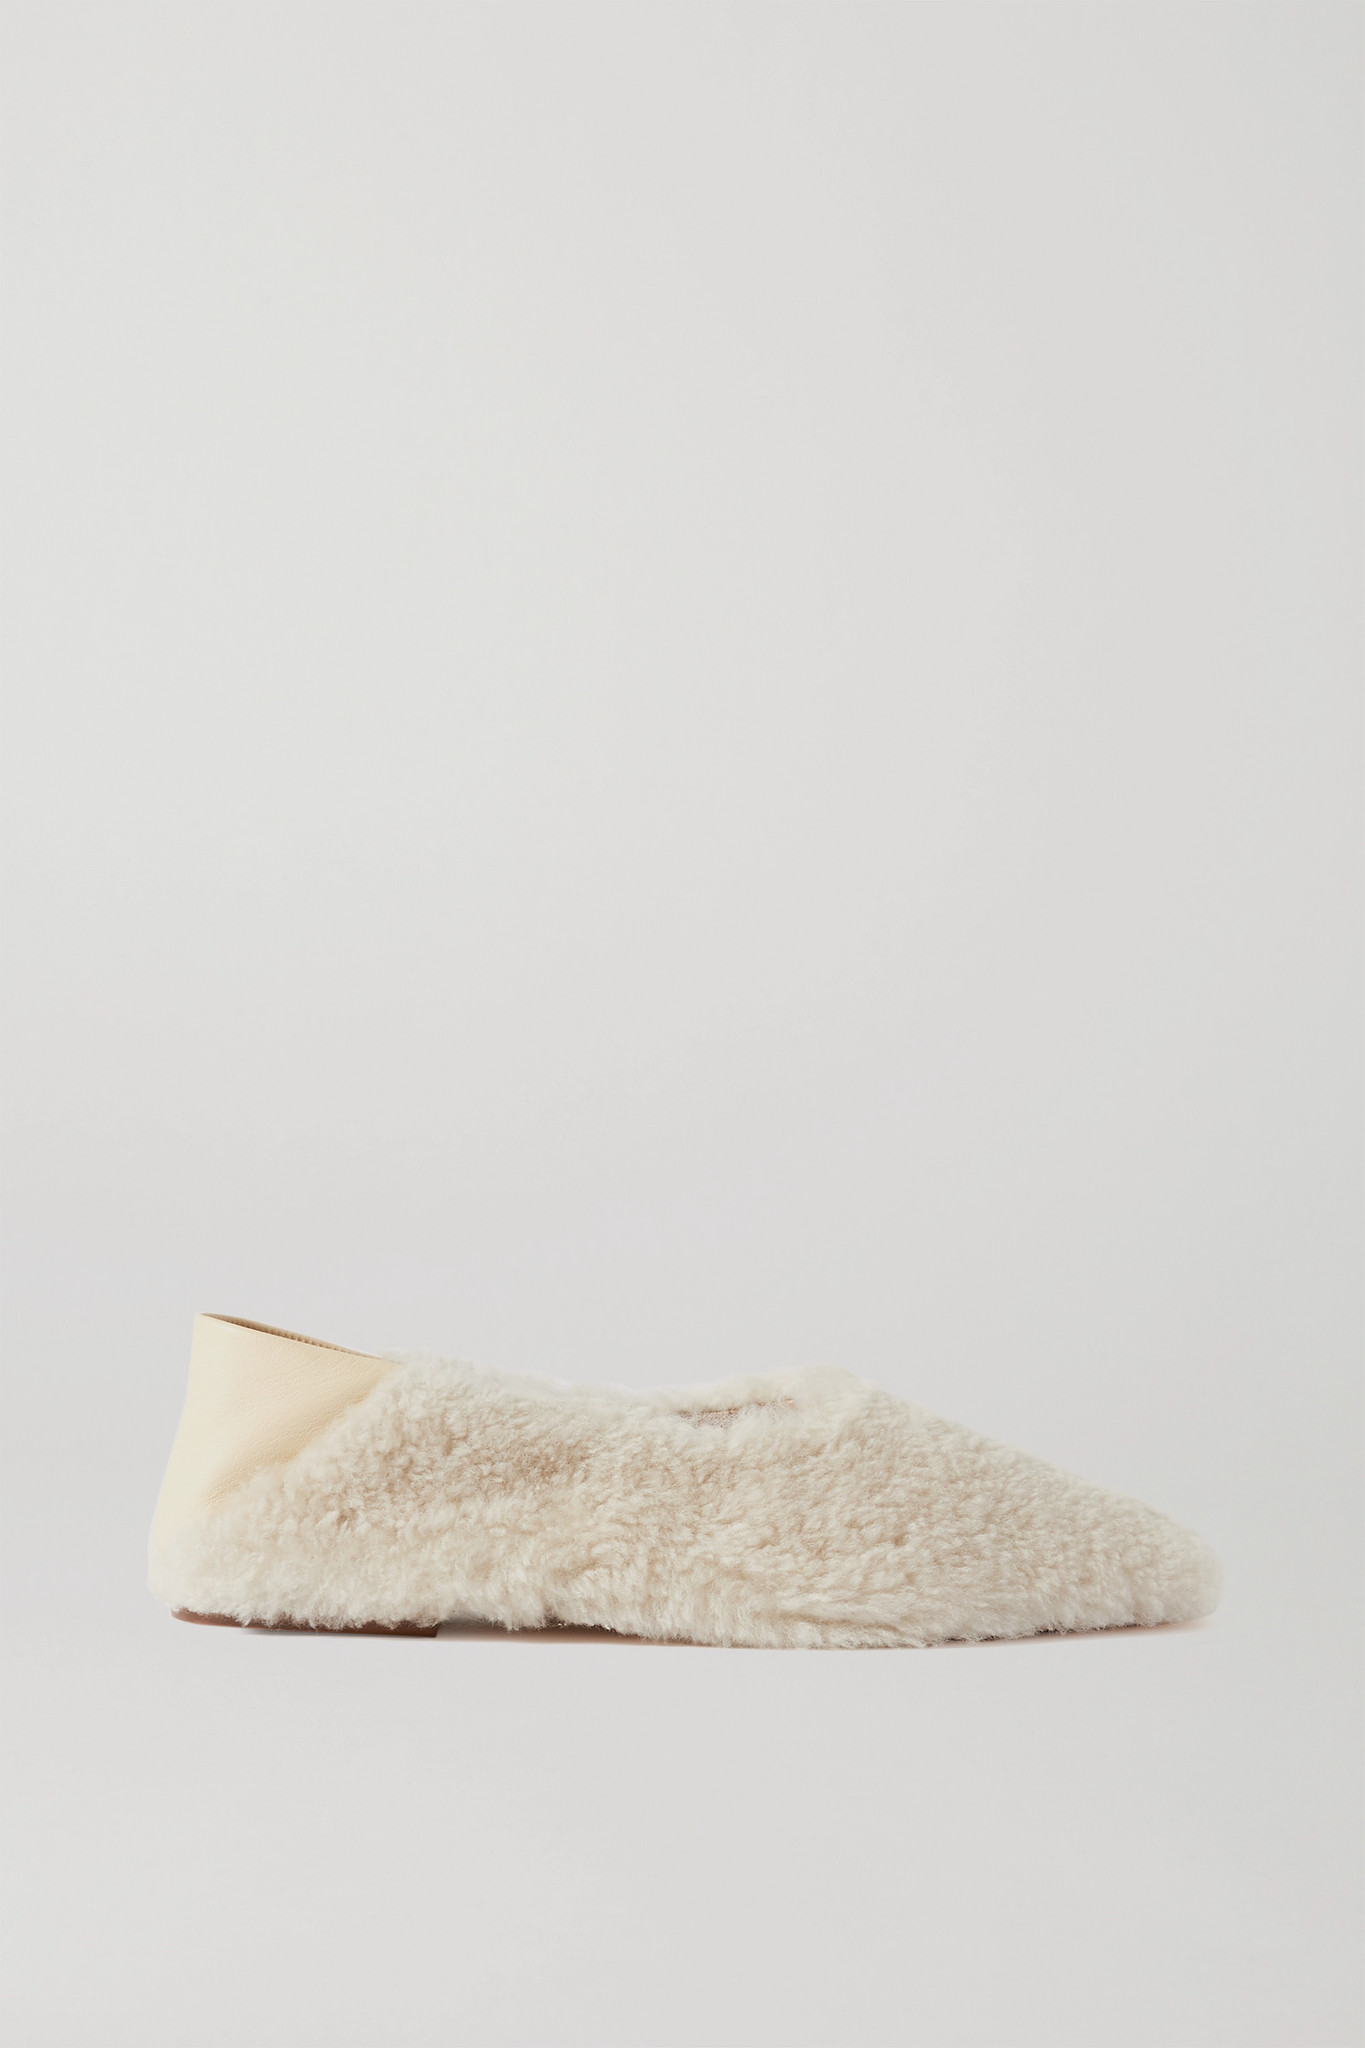 PORTE & PAIRE - 羊毛皮皮革折叠式后跟乐福鞋 - 象牙色 - IT38